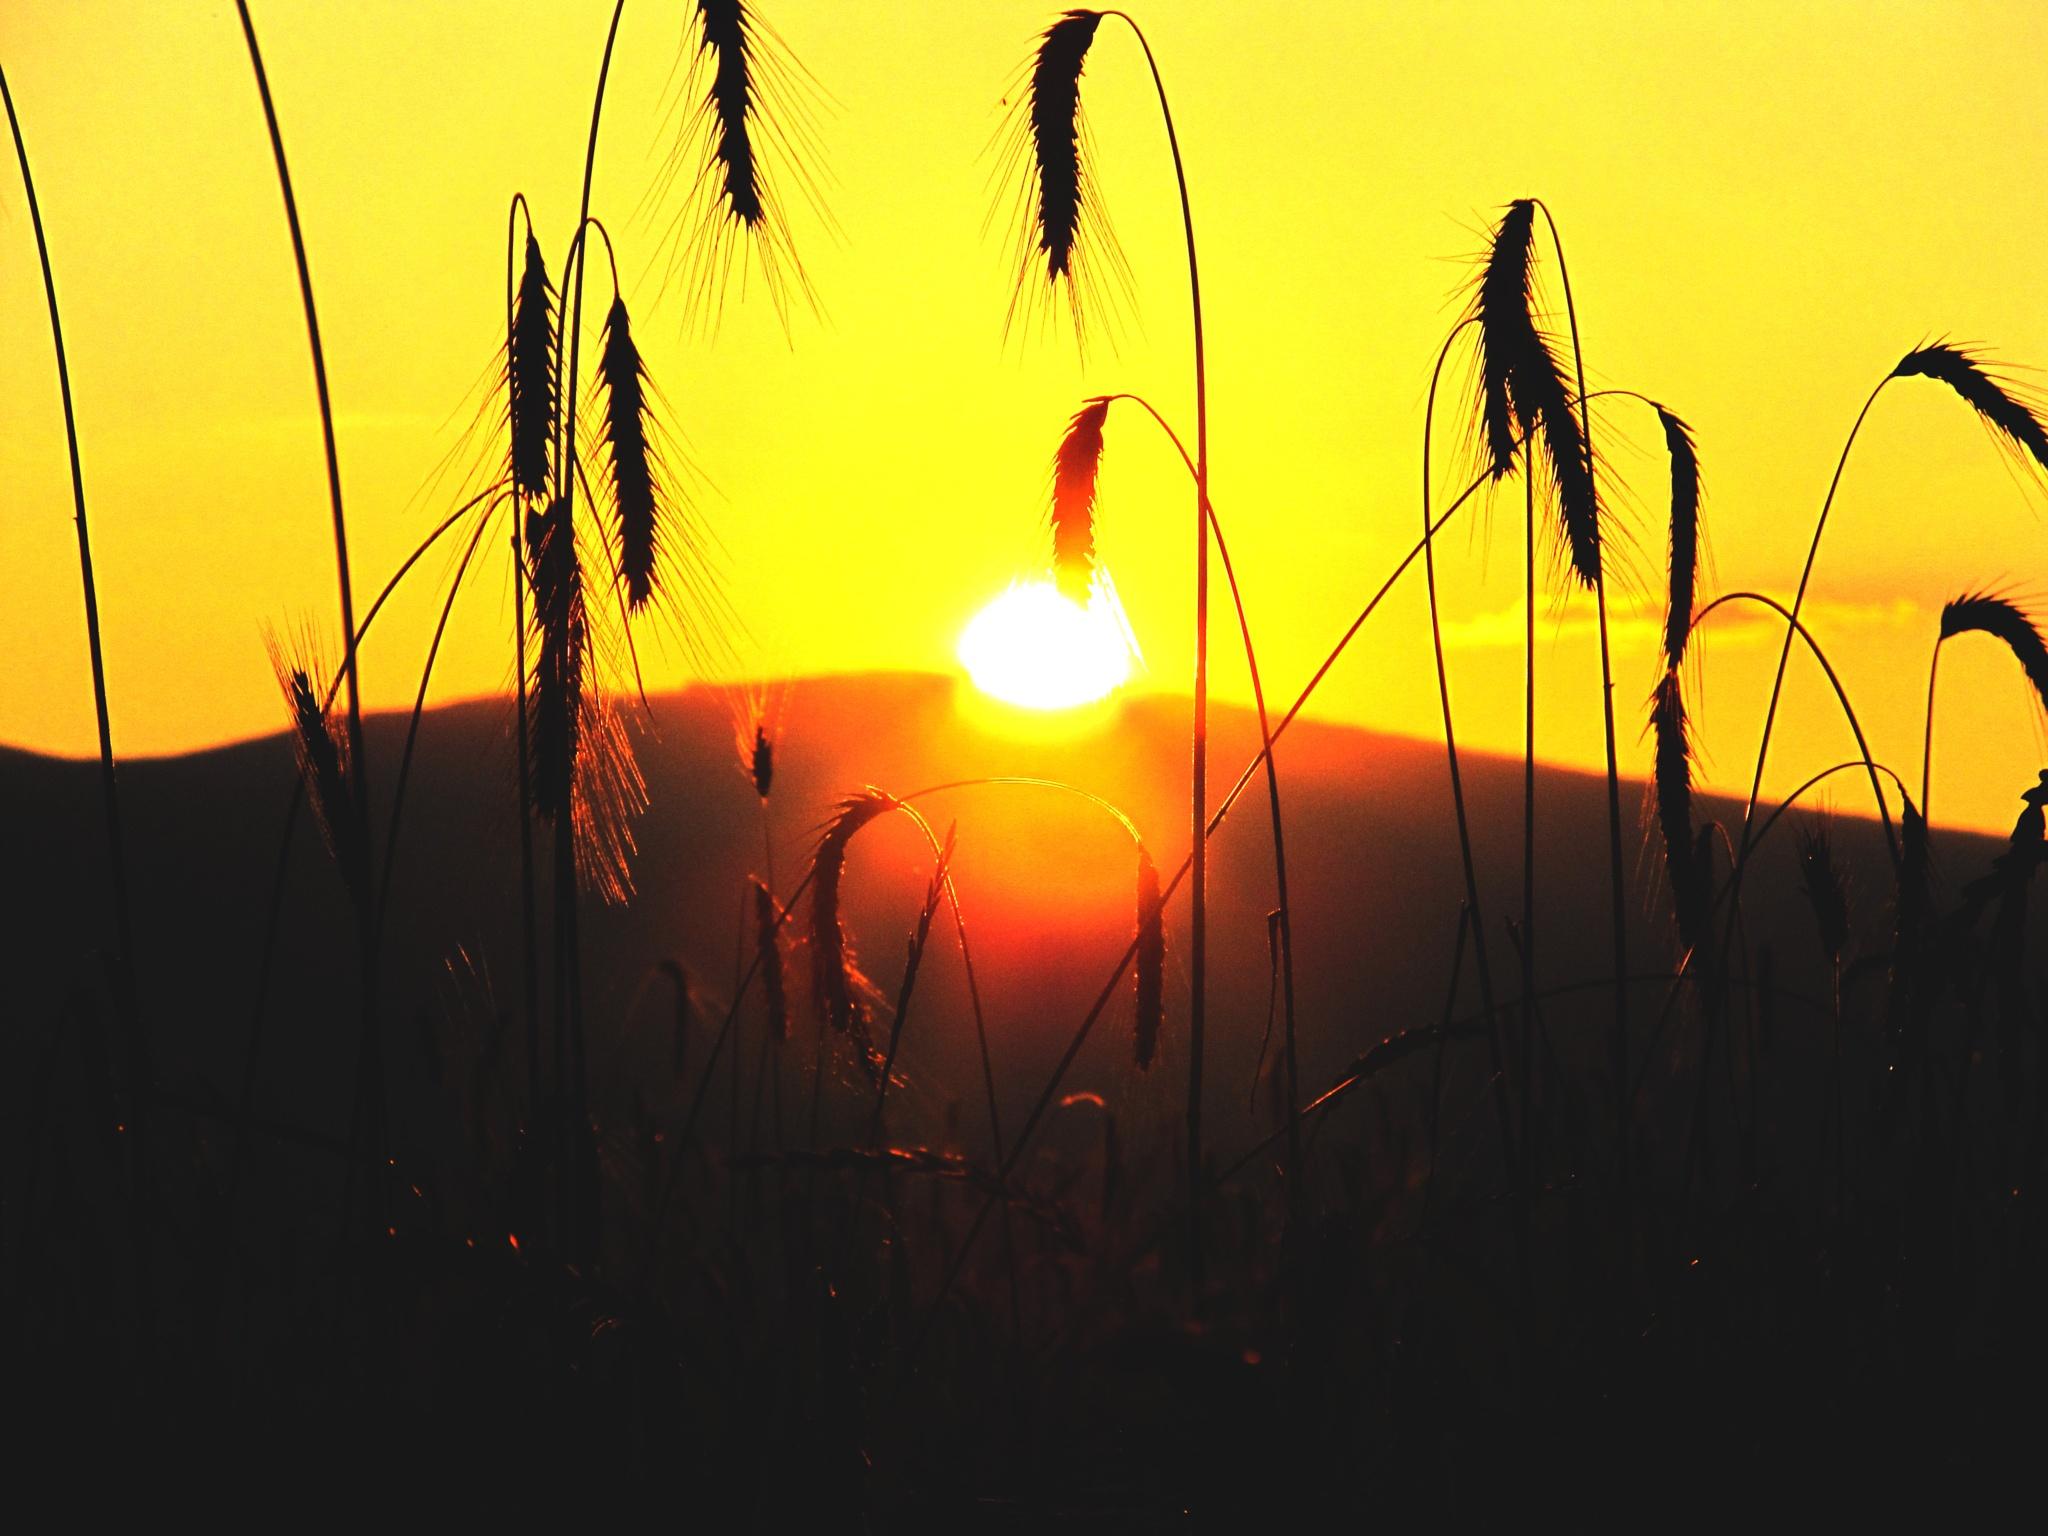 the sun always shines by Bence Nagy